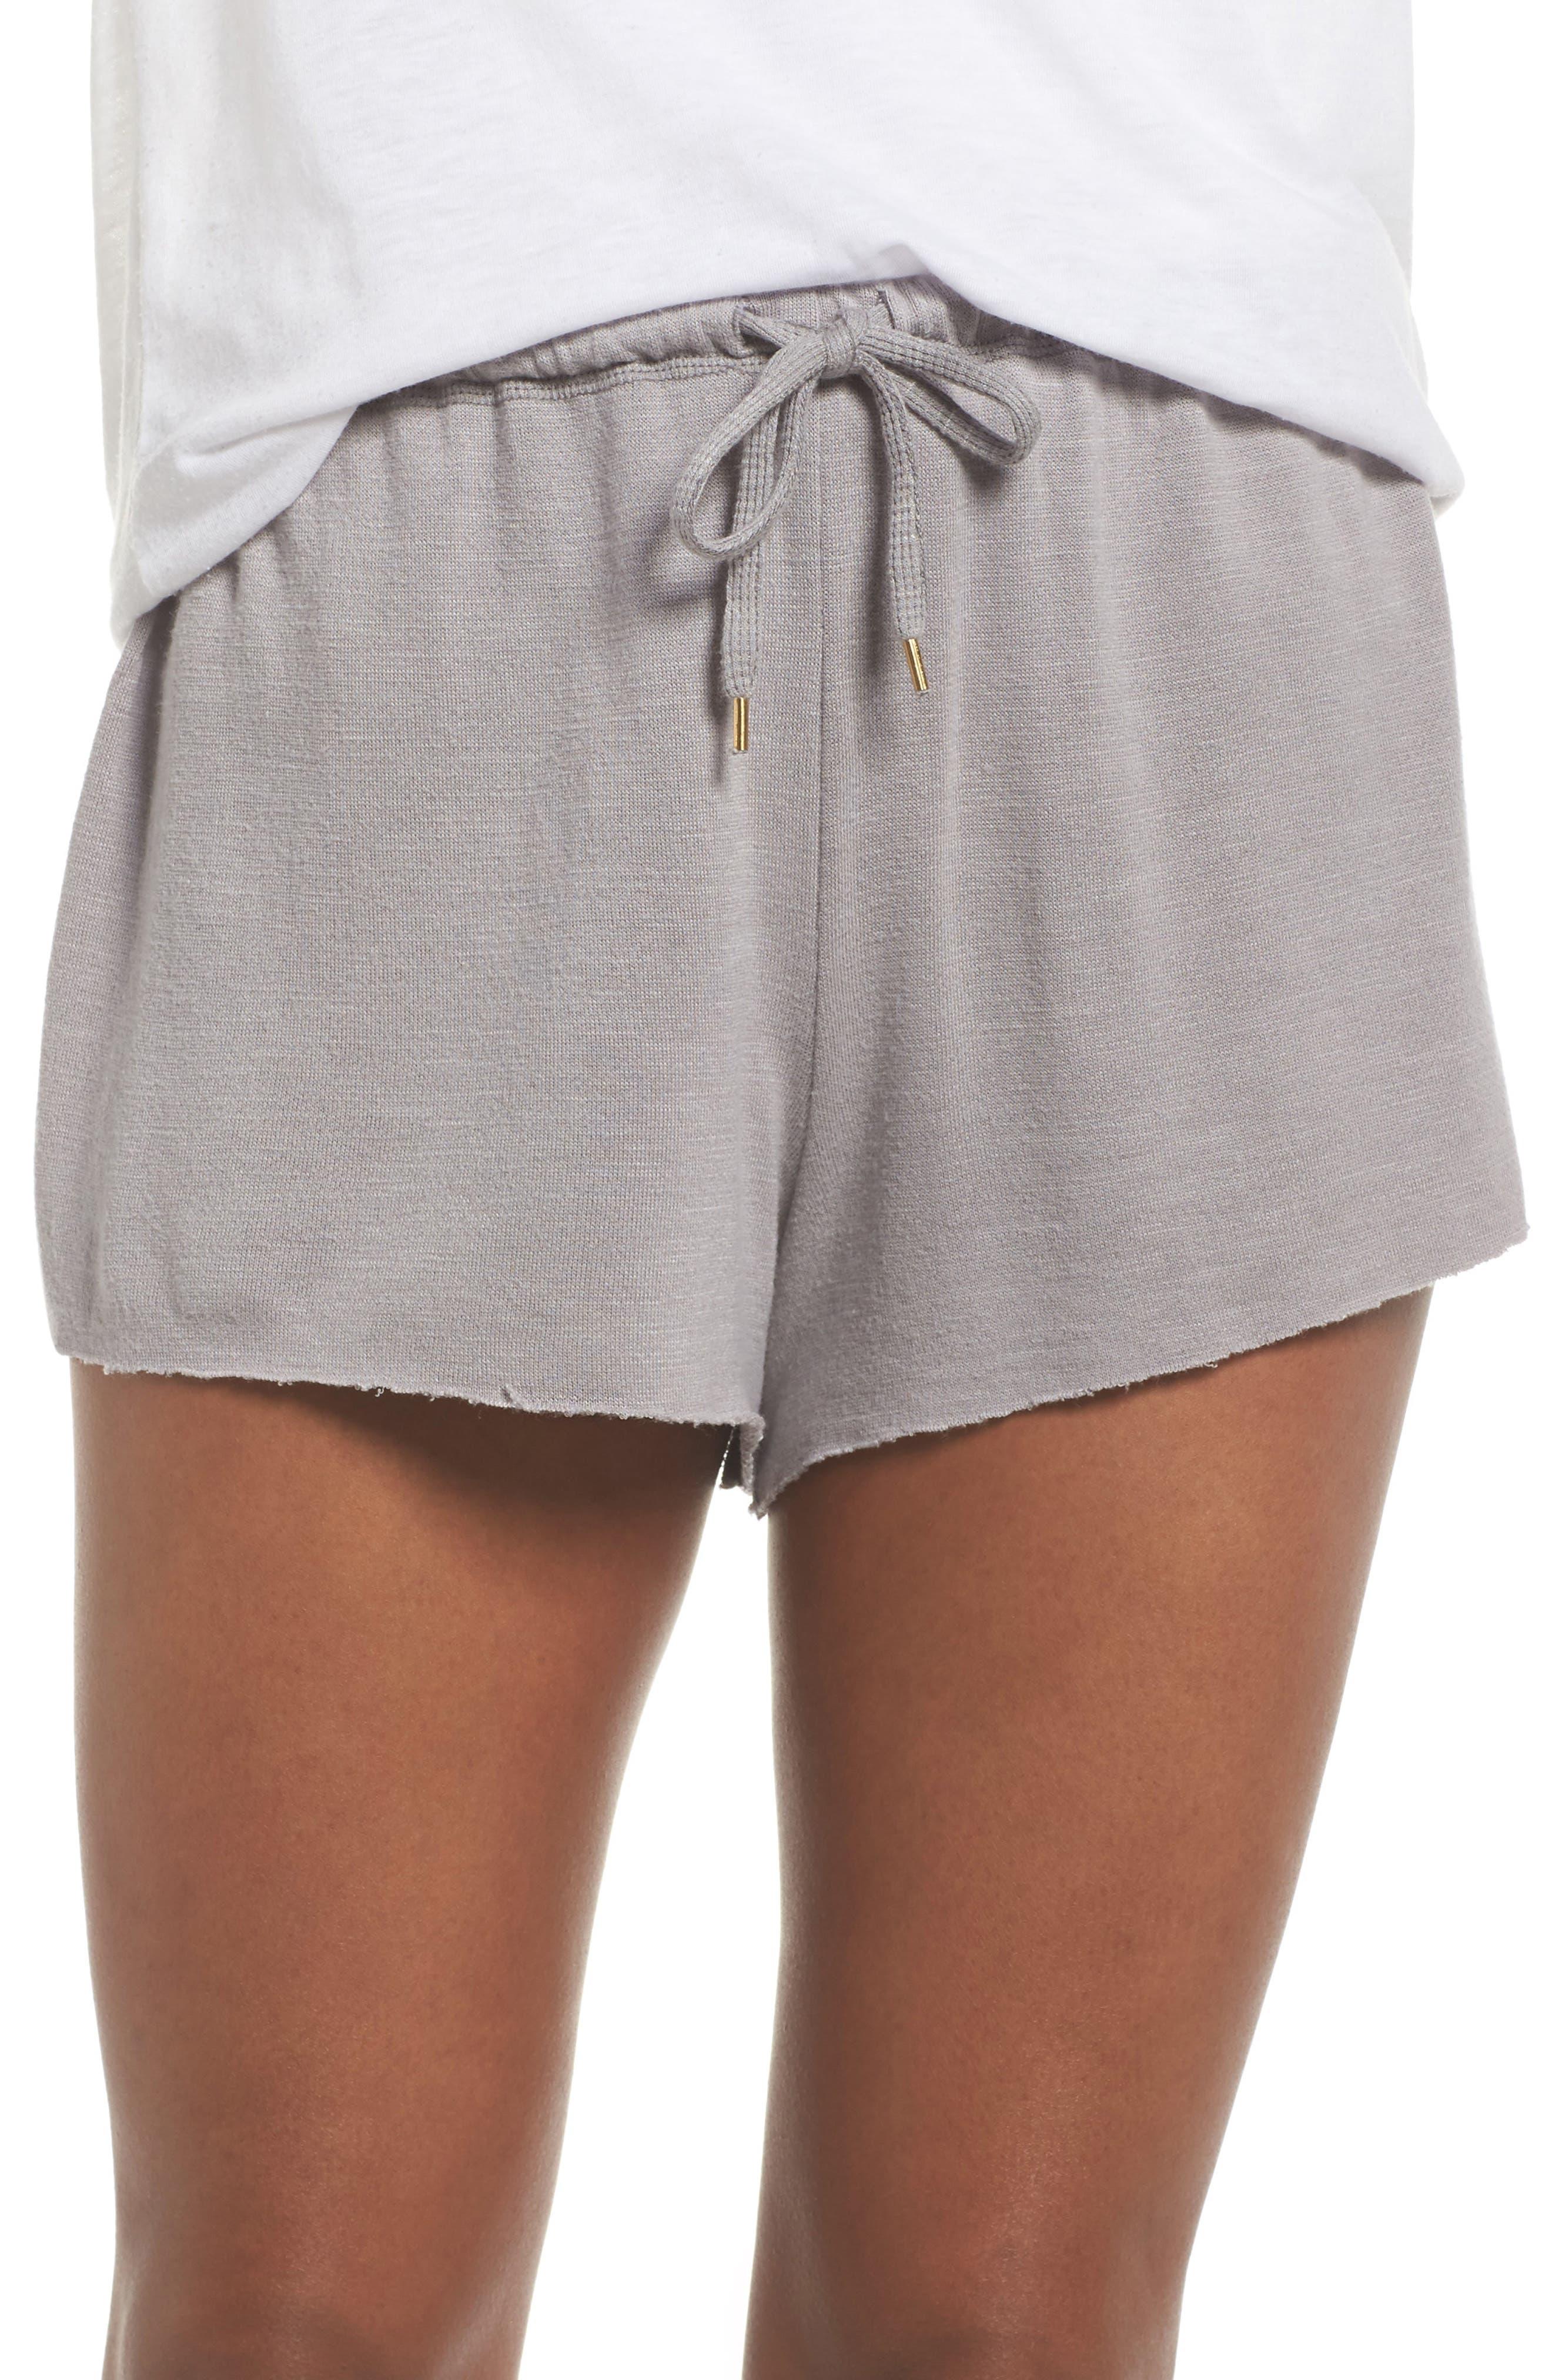 Honeydew Intimates French Terry Lounge Shorts